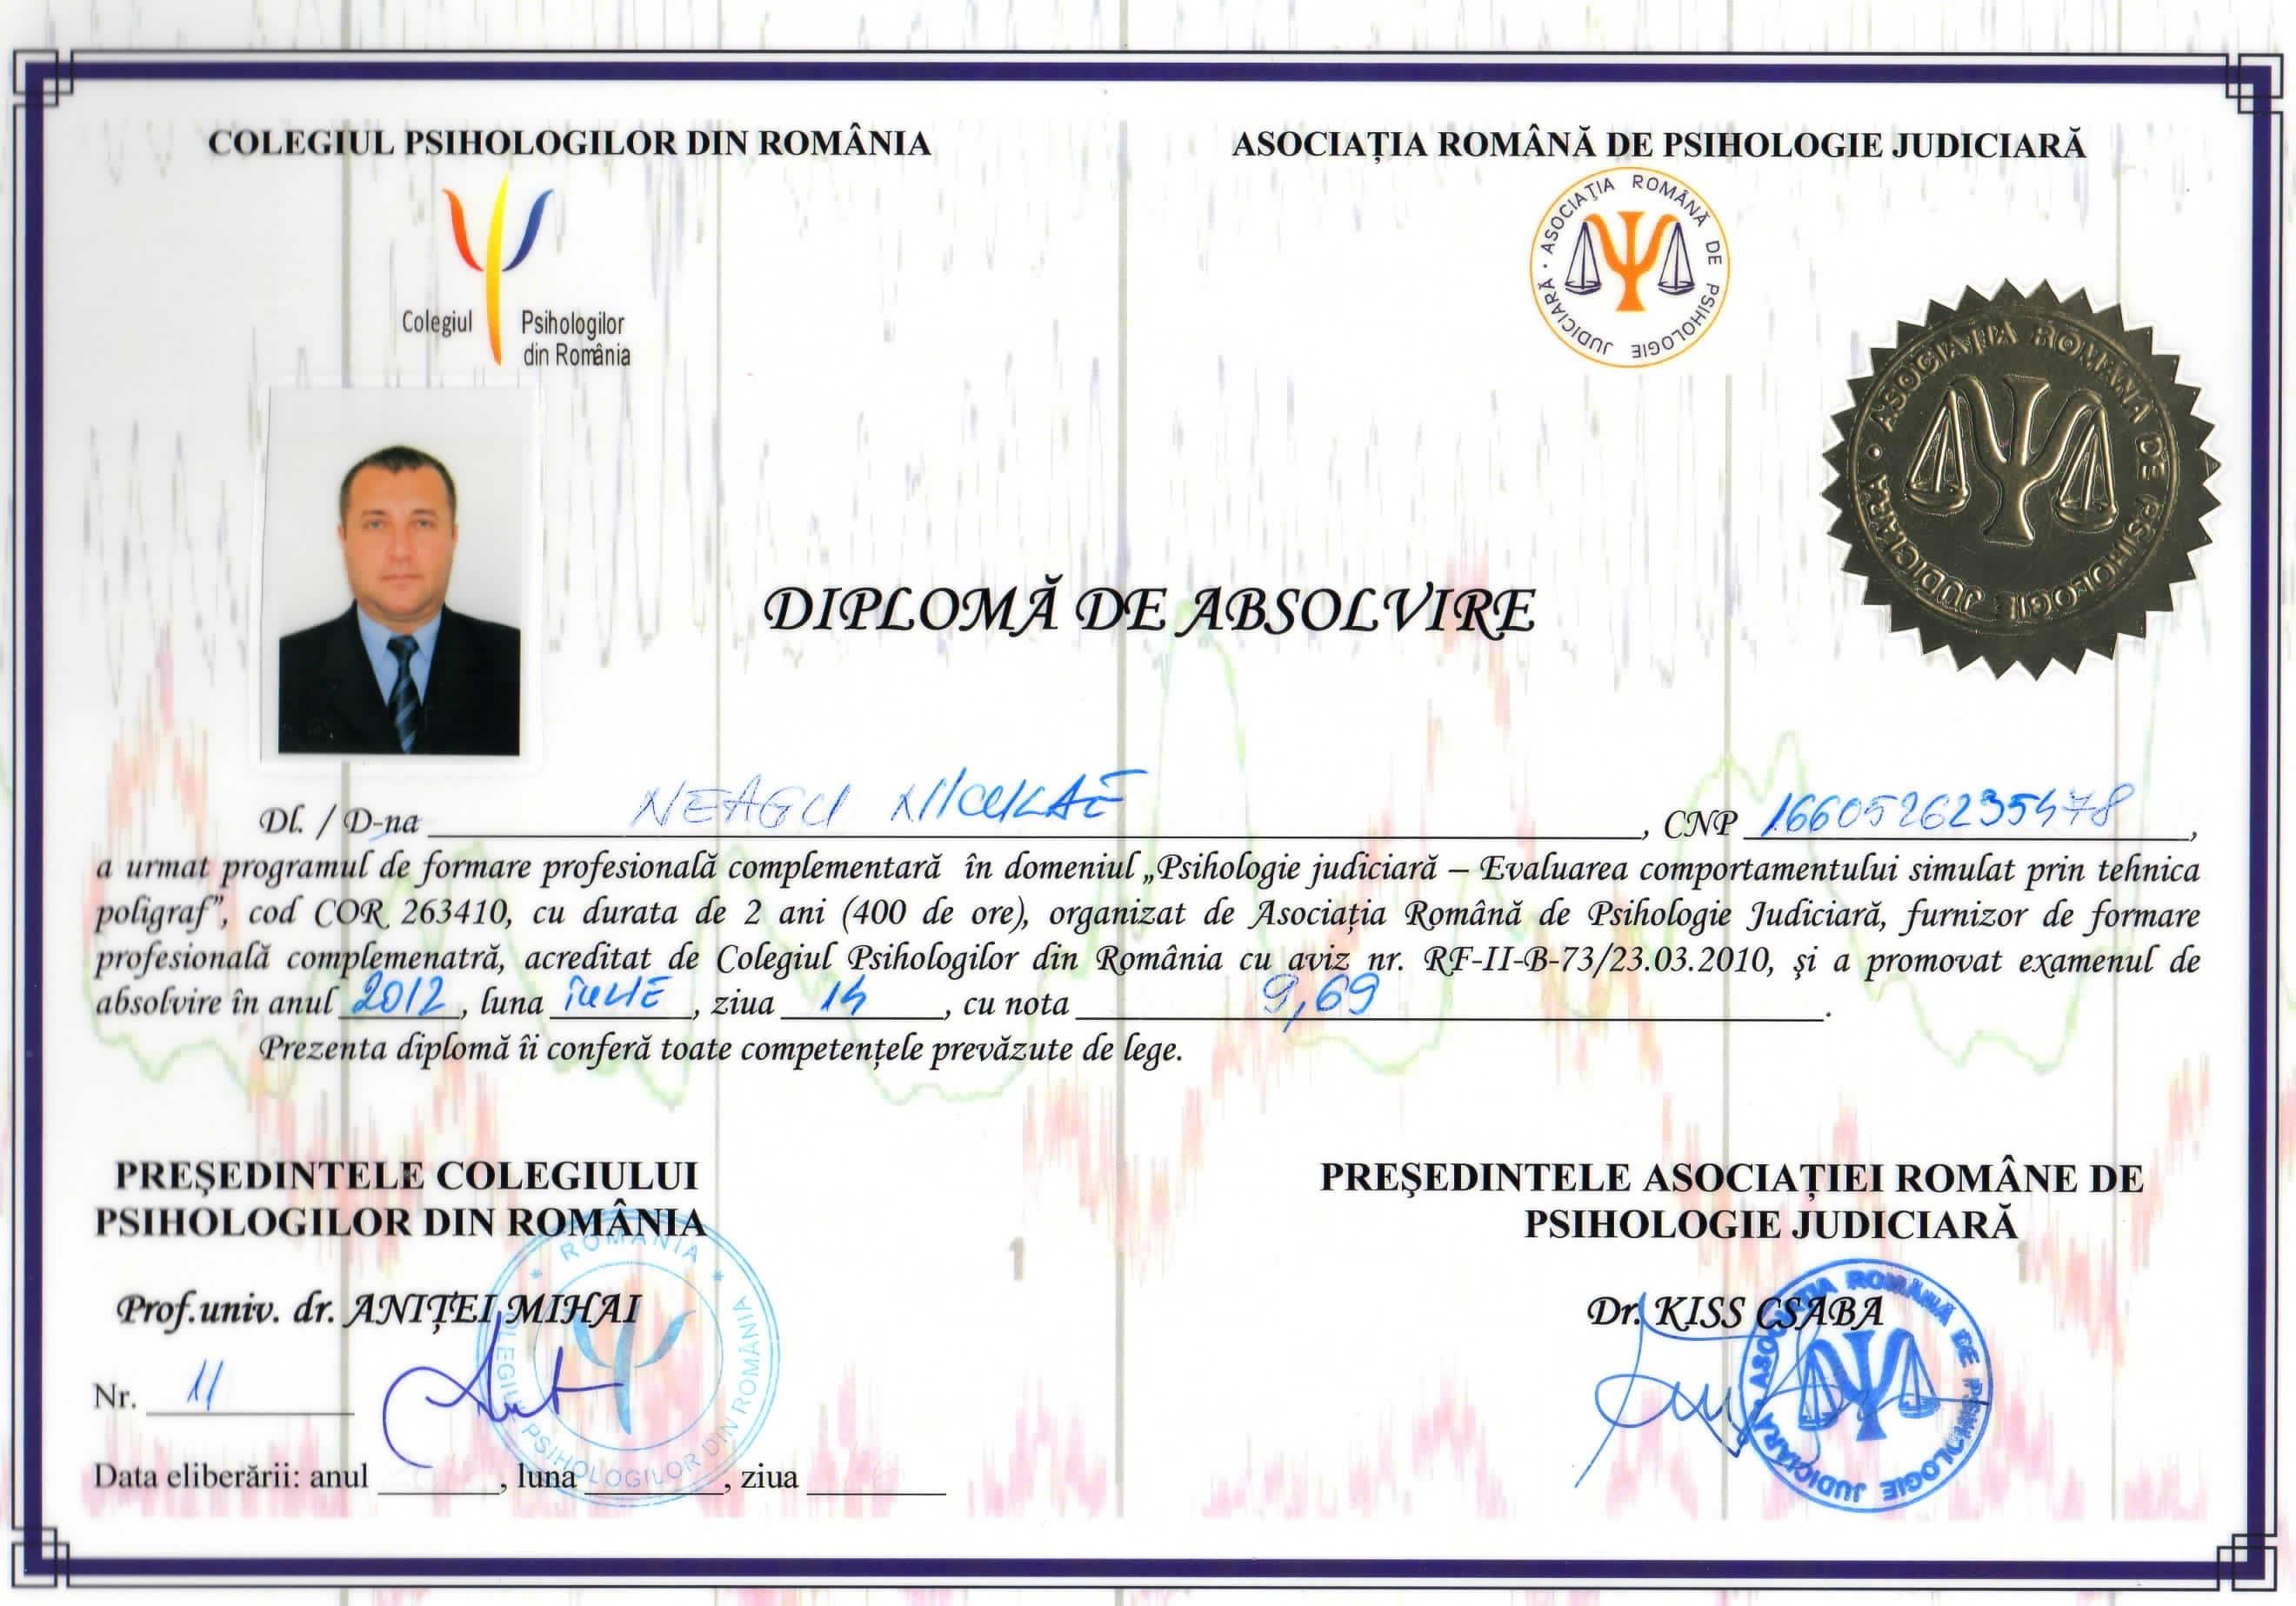 Europolygraph